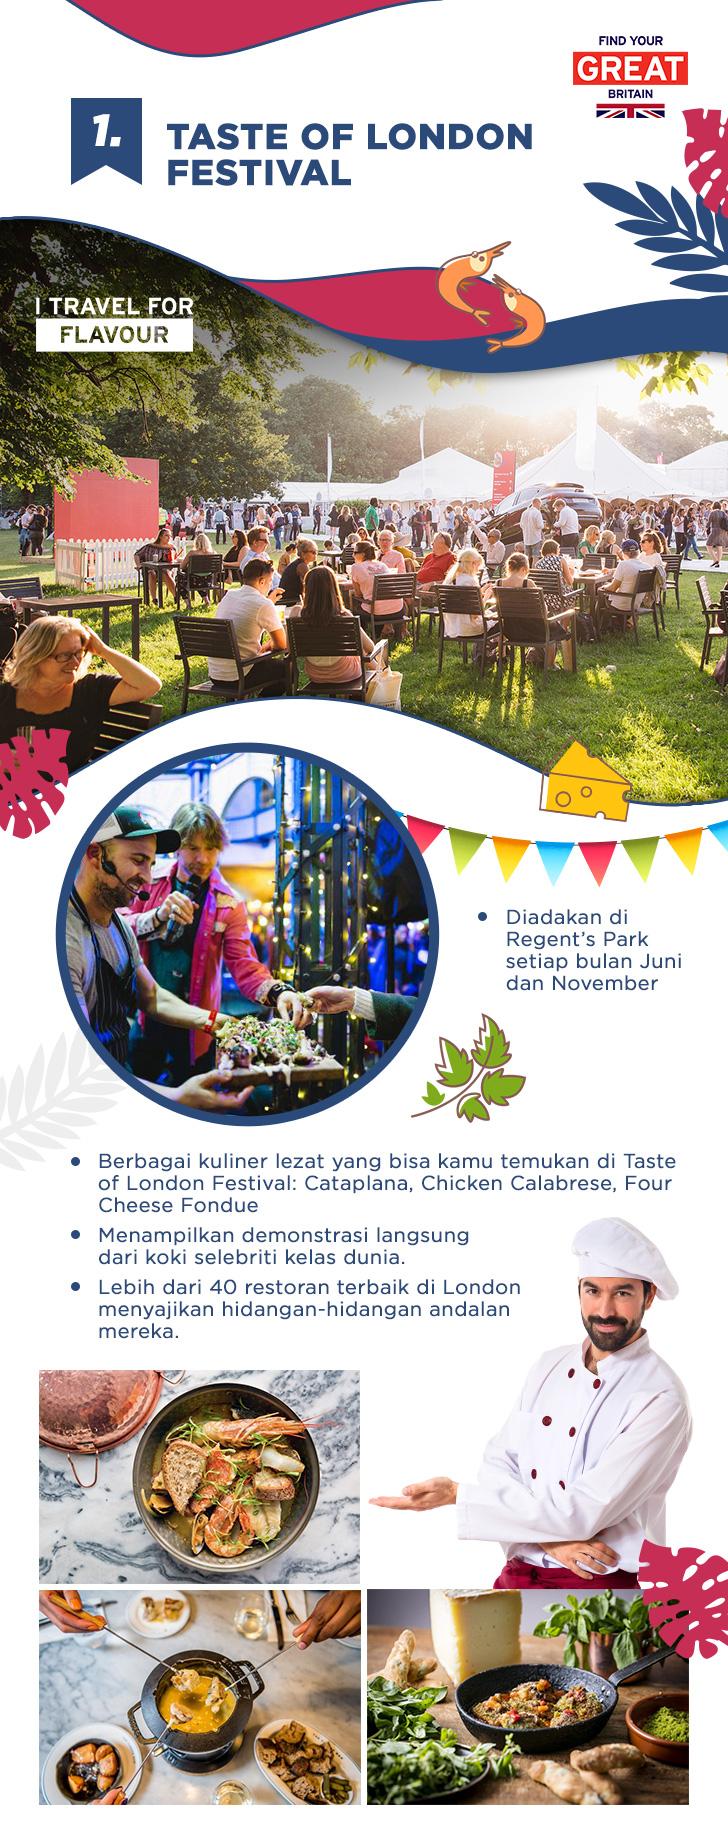 food-festival, inggris, infographic, uk, travel